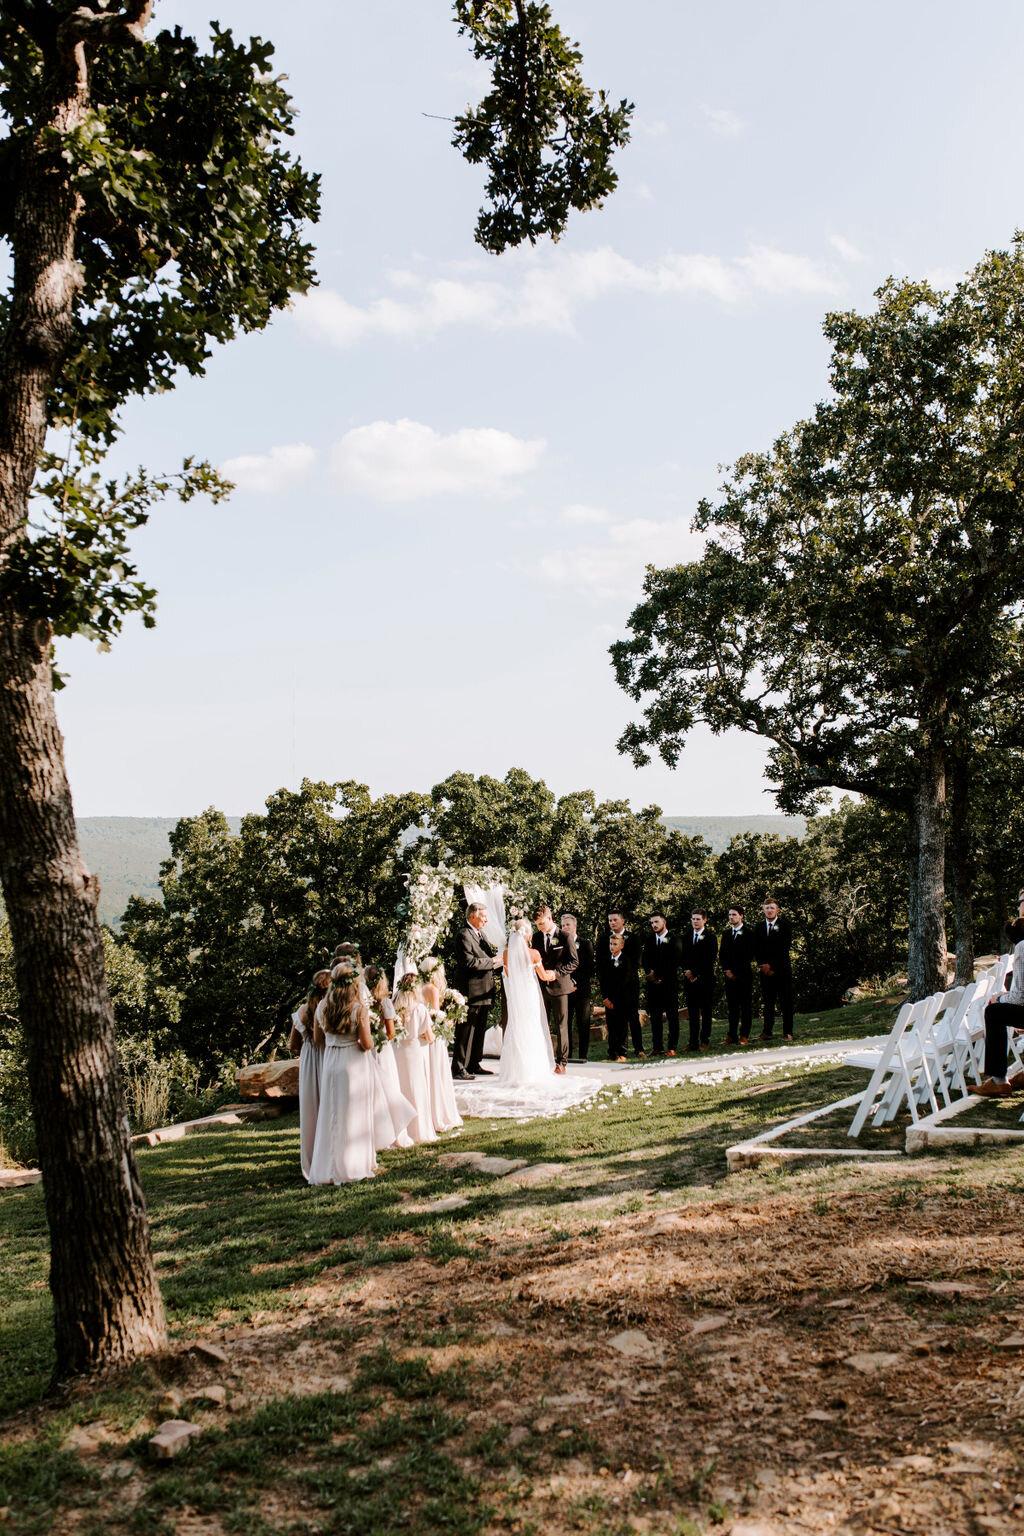 Tulsa White Barn Wedding Venue Outdoor Ceremony 91.jpg